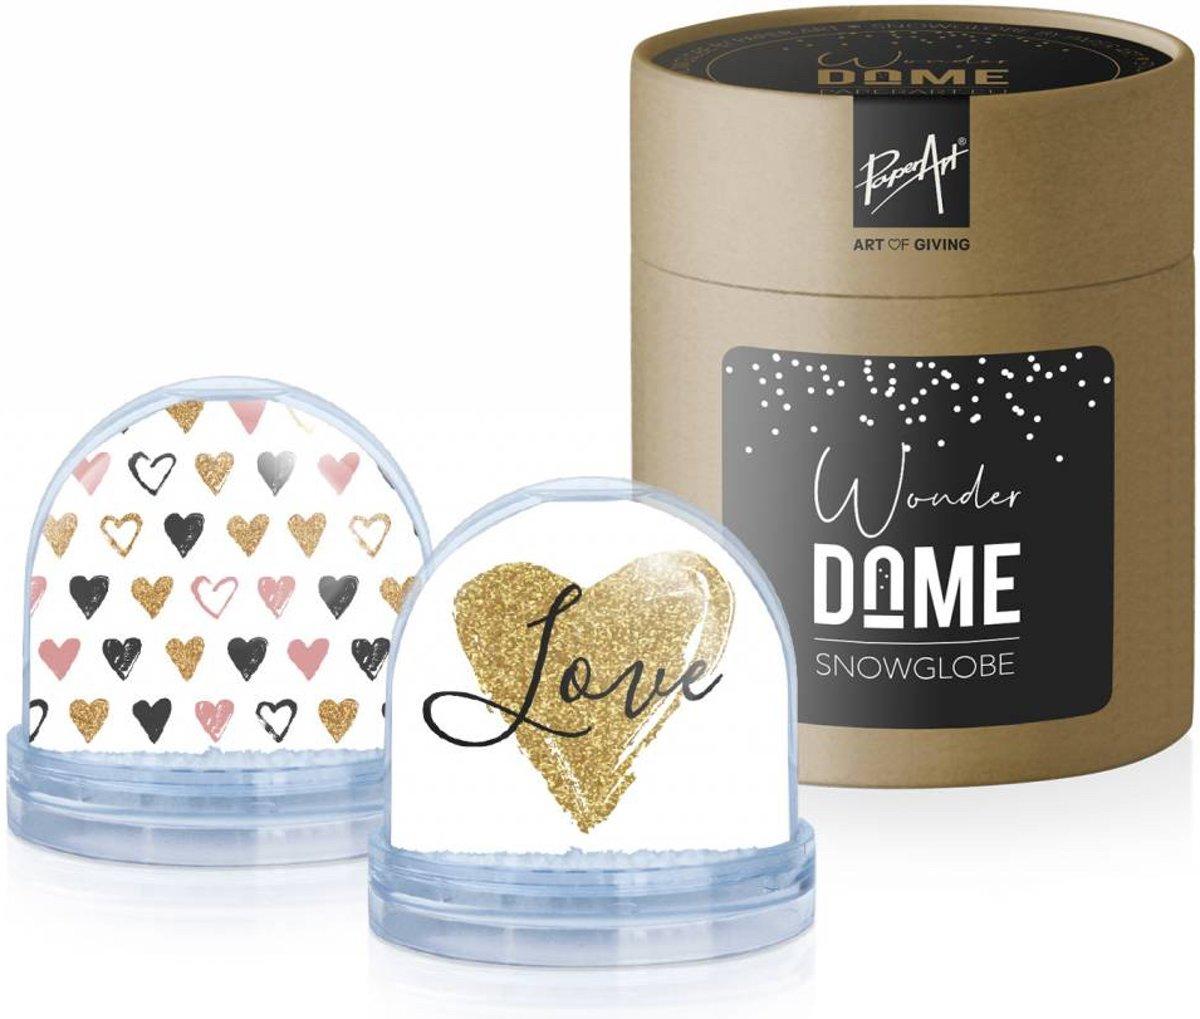 Sneeuwbol 'Wonder Dome' - Love kopen